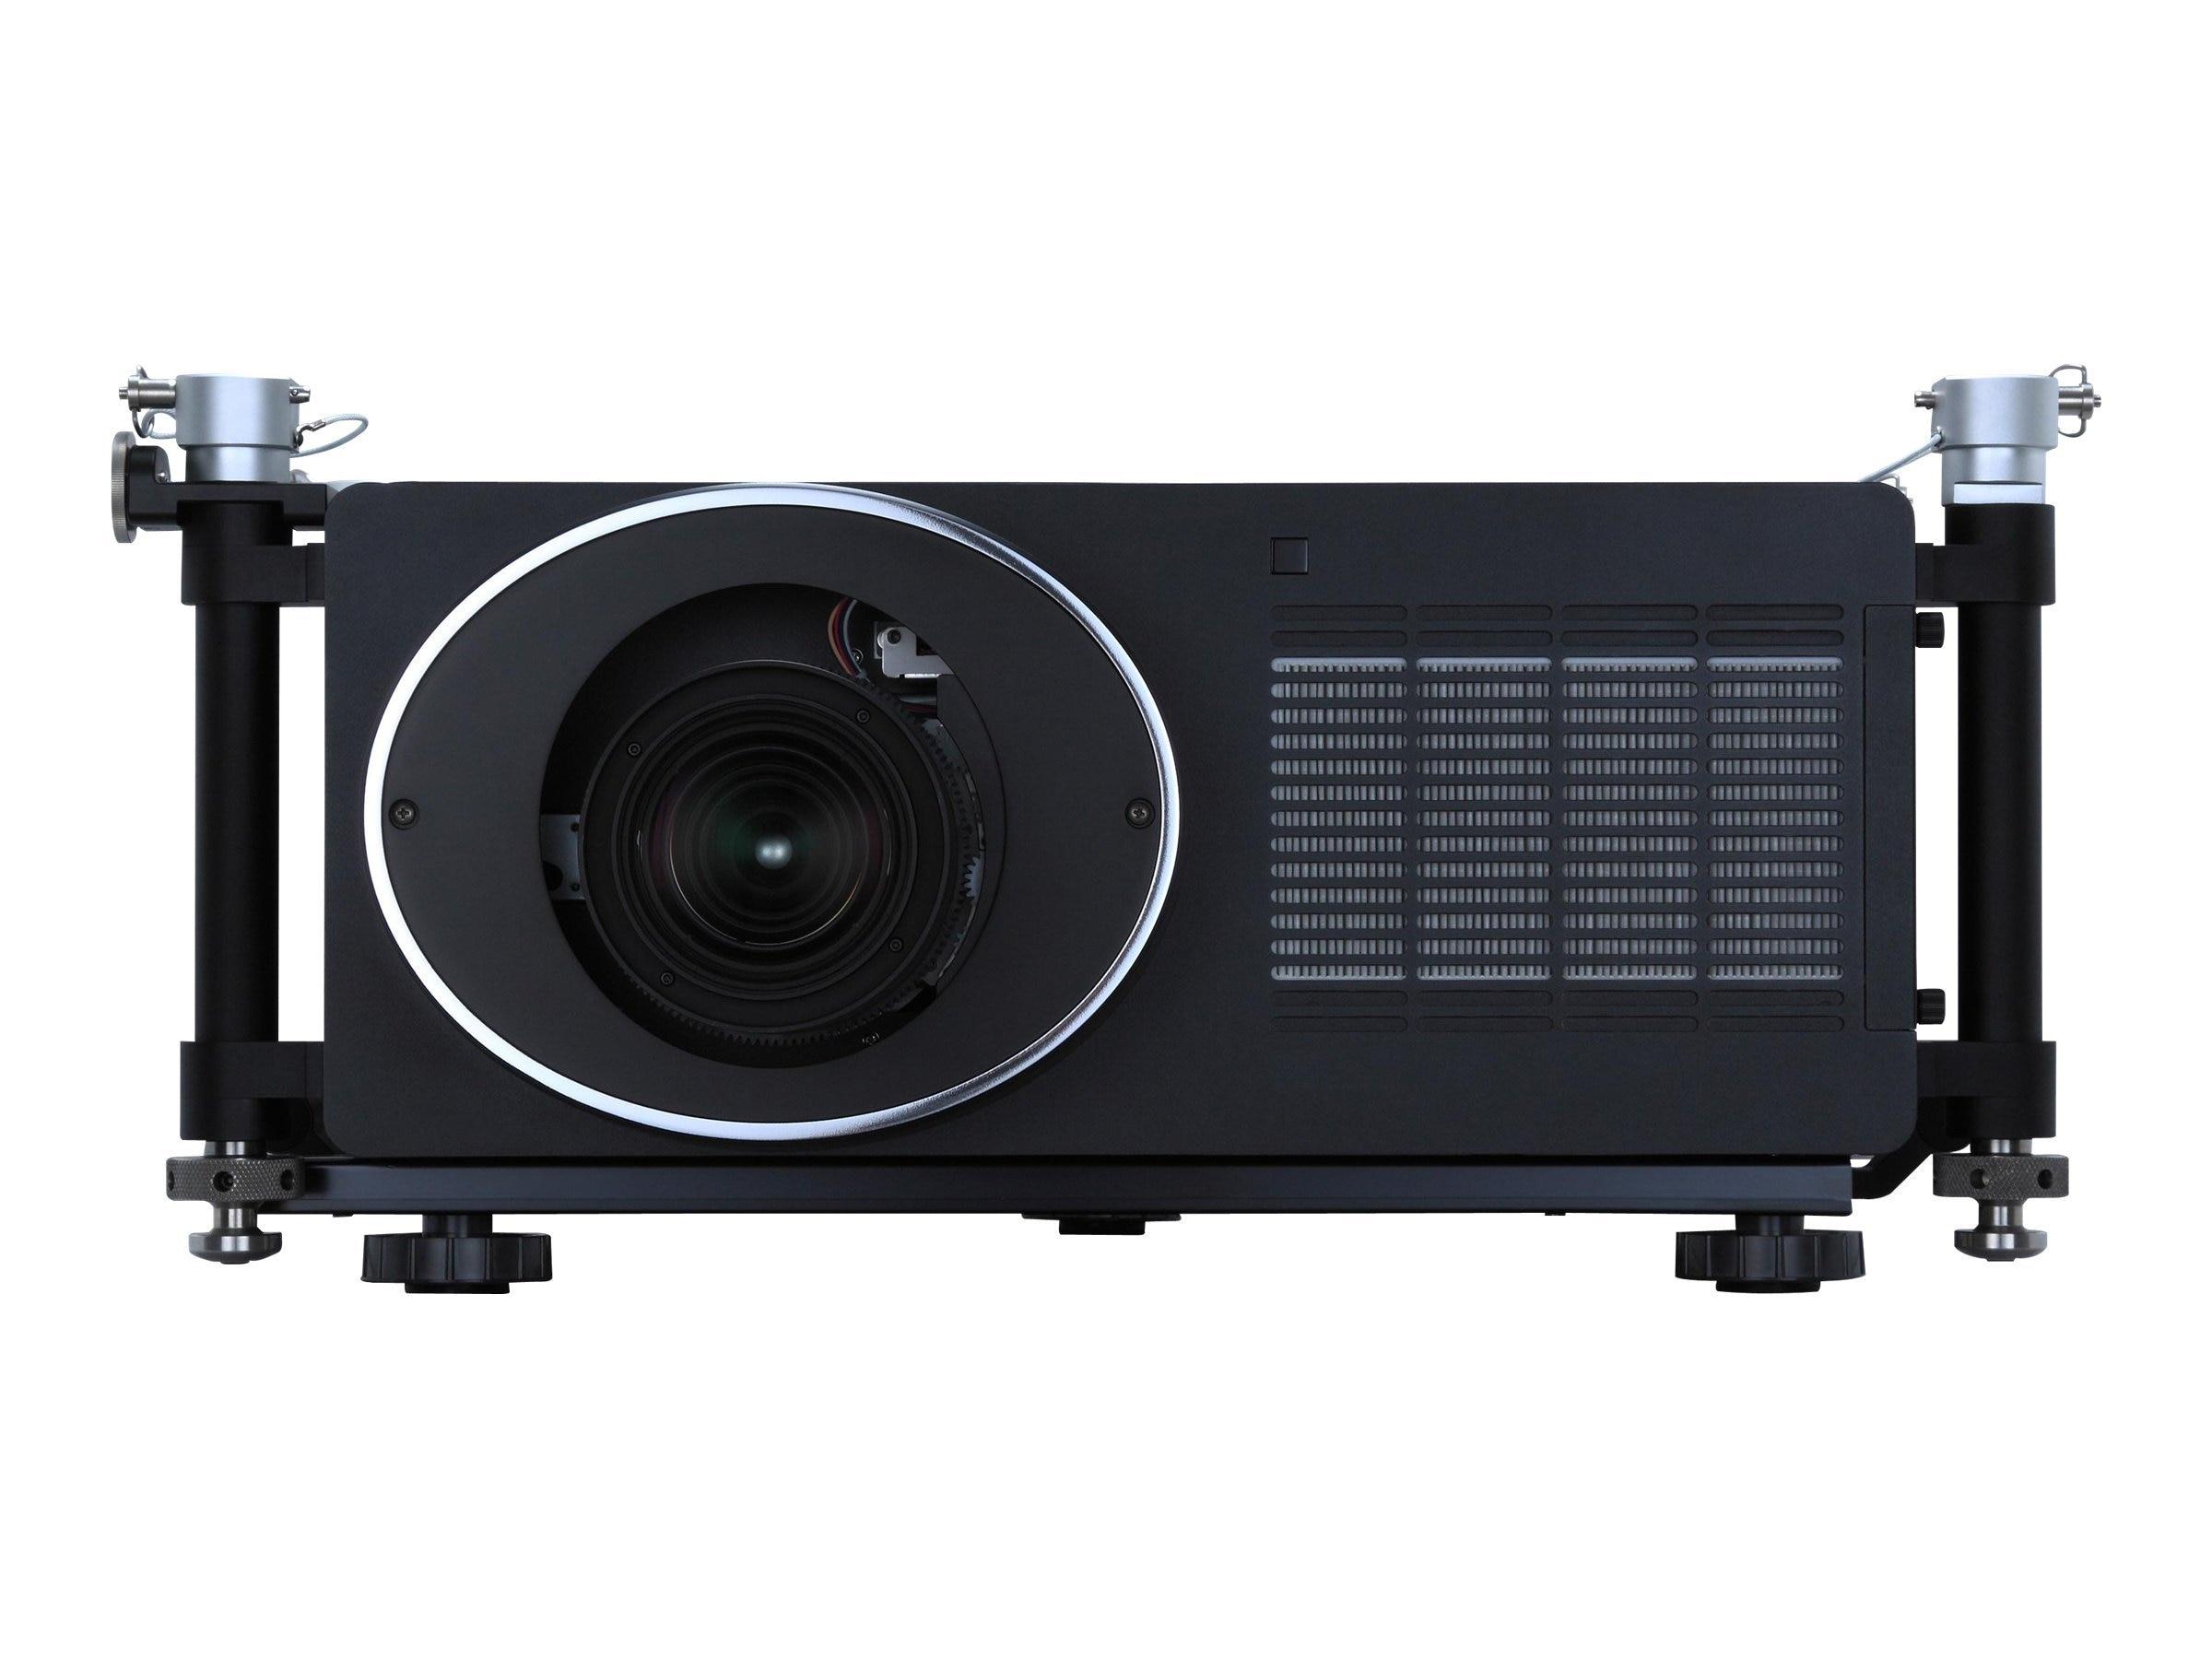 NEC NP-PH1000U Image 2